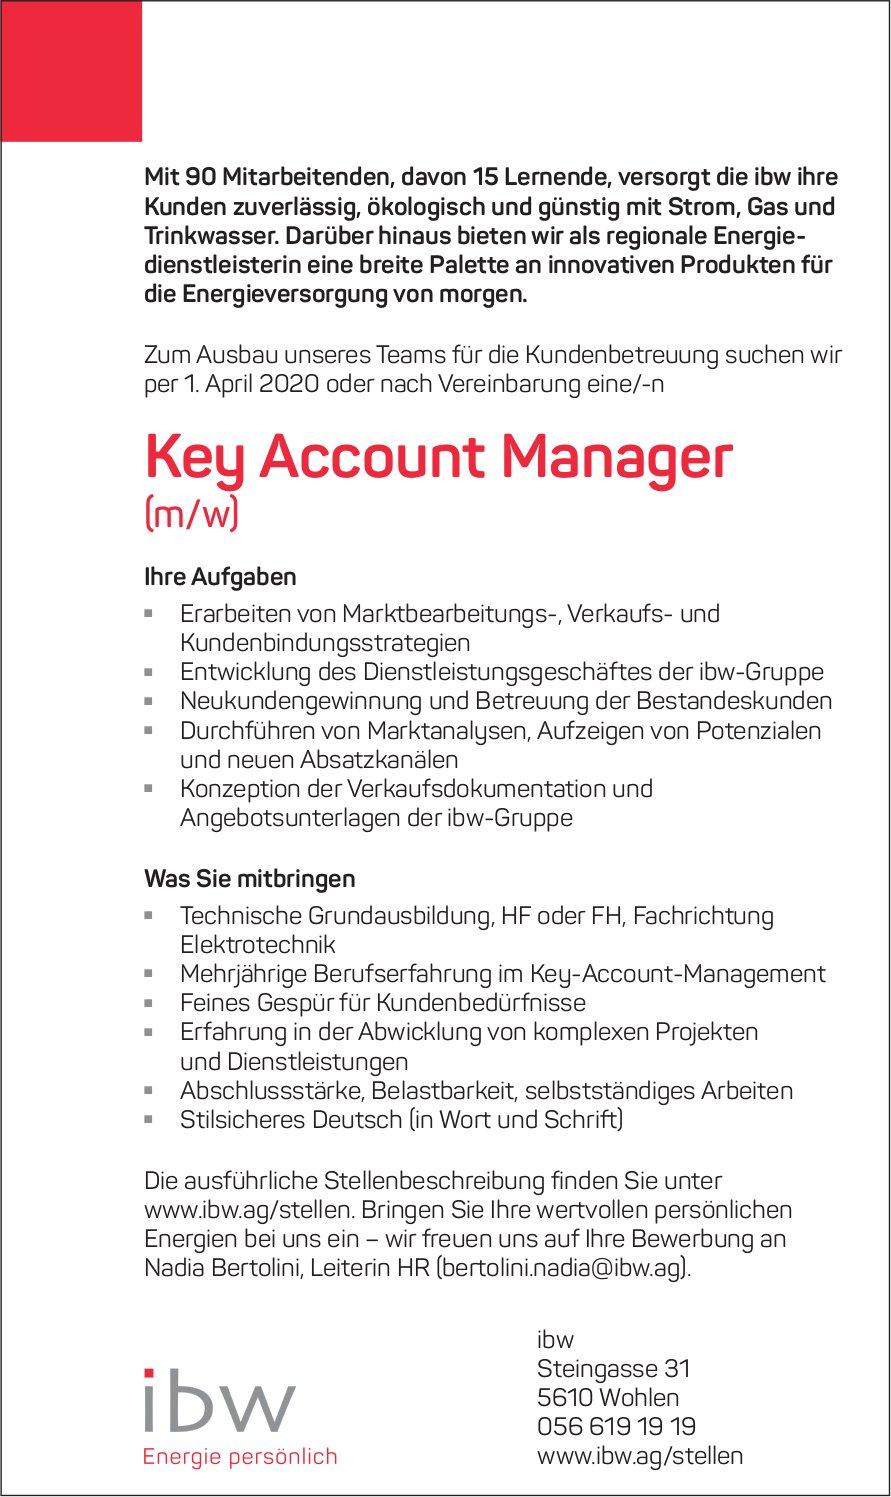 Key Account Manager (m/w) gesucht